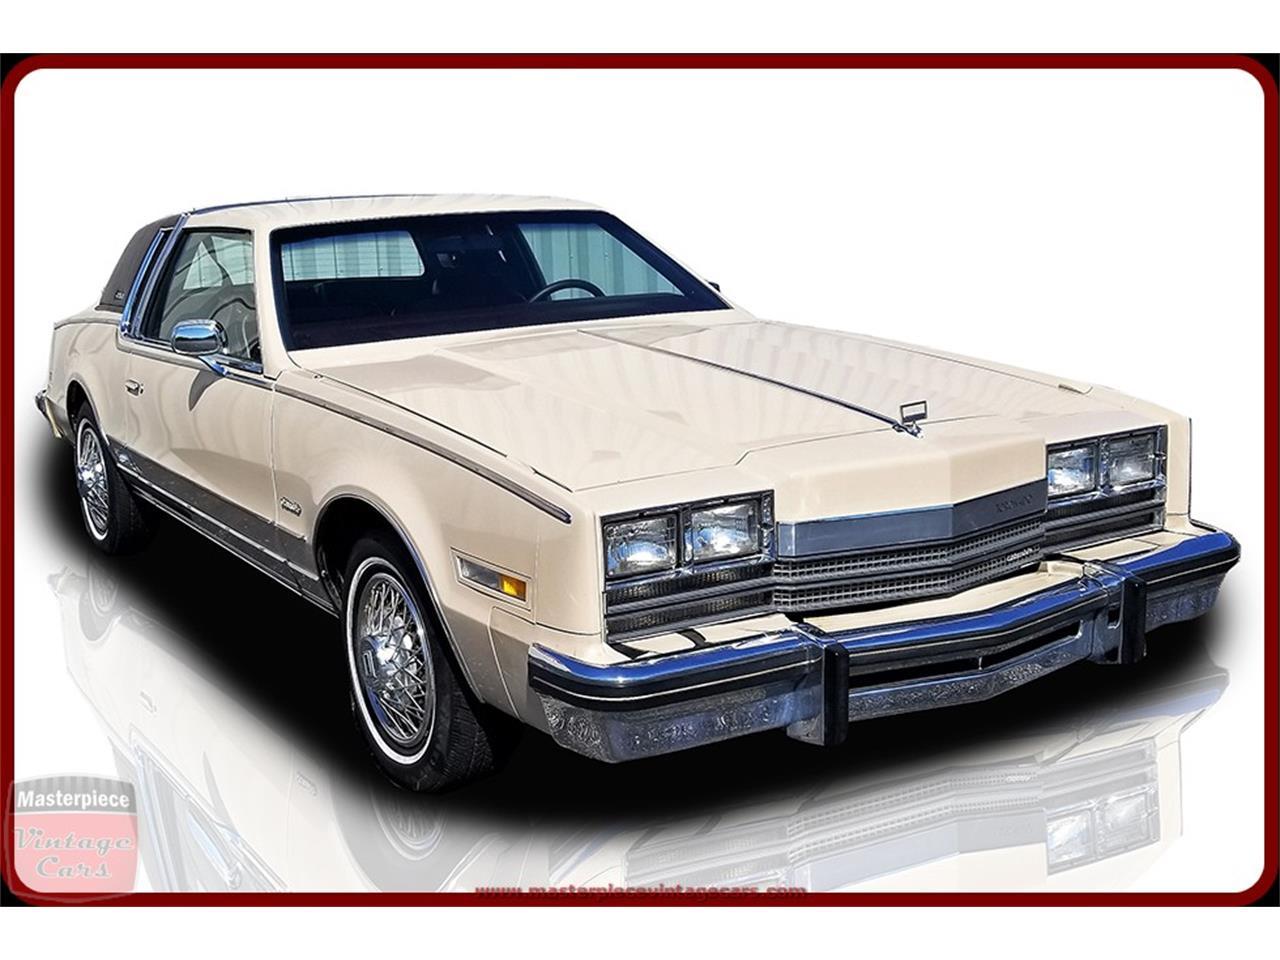 Large Picture of '85 Toronado located in Indiana - $5,950.00 - Q4ZA